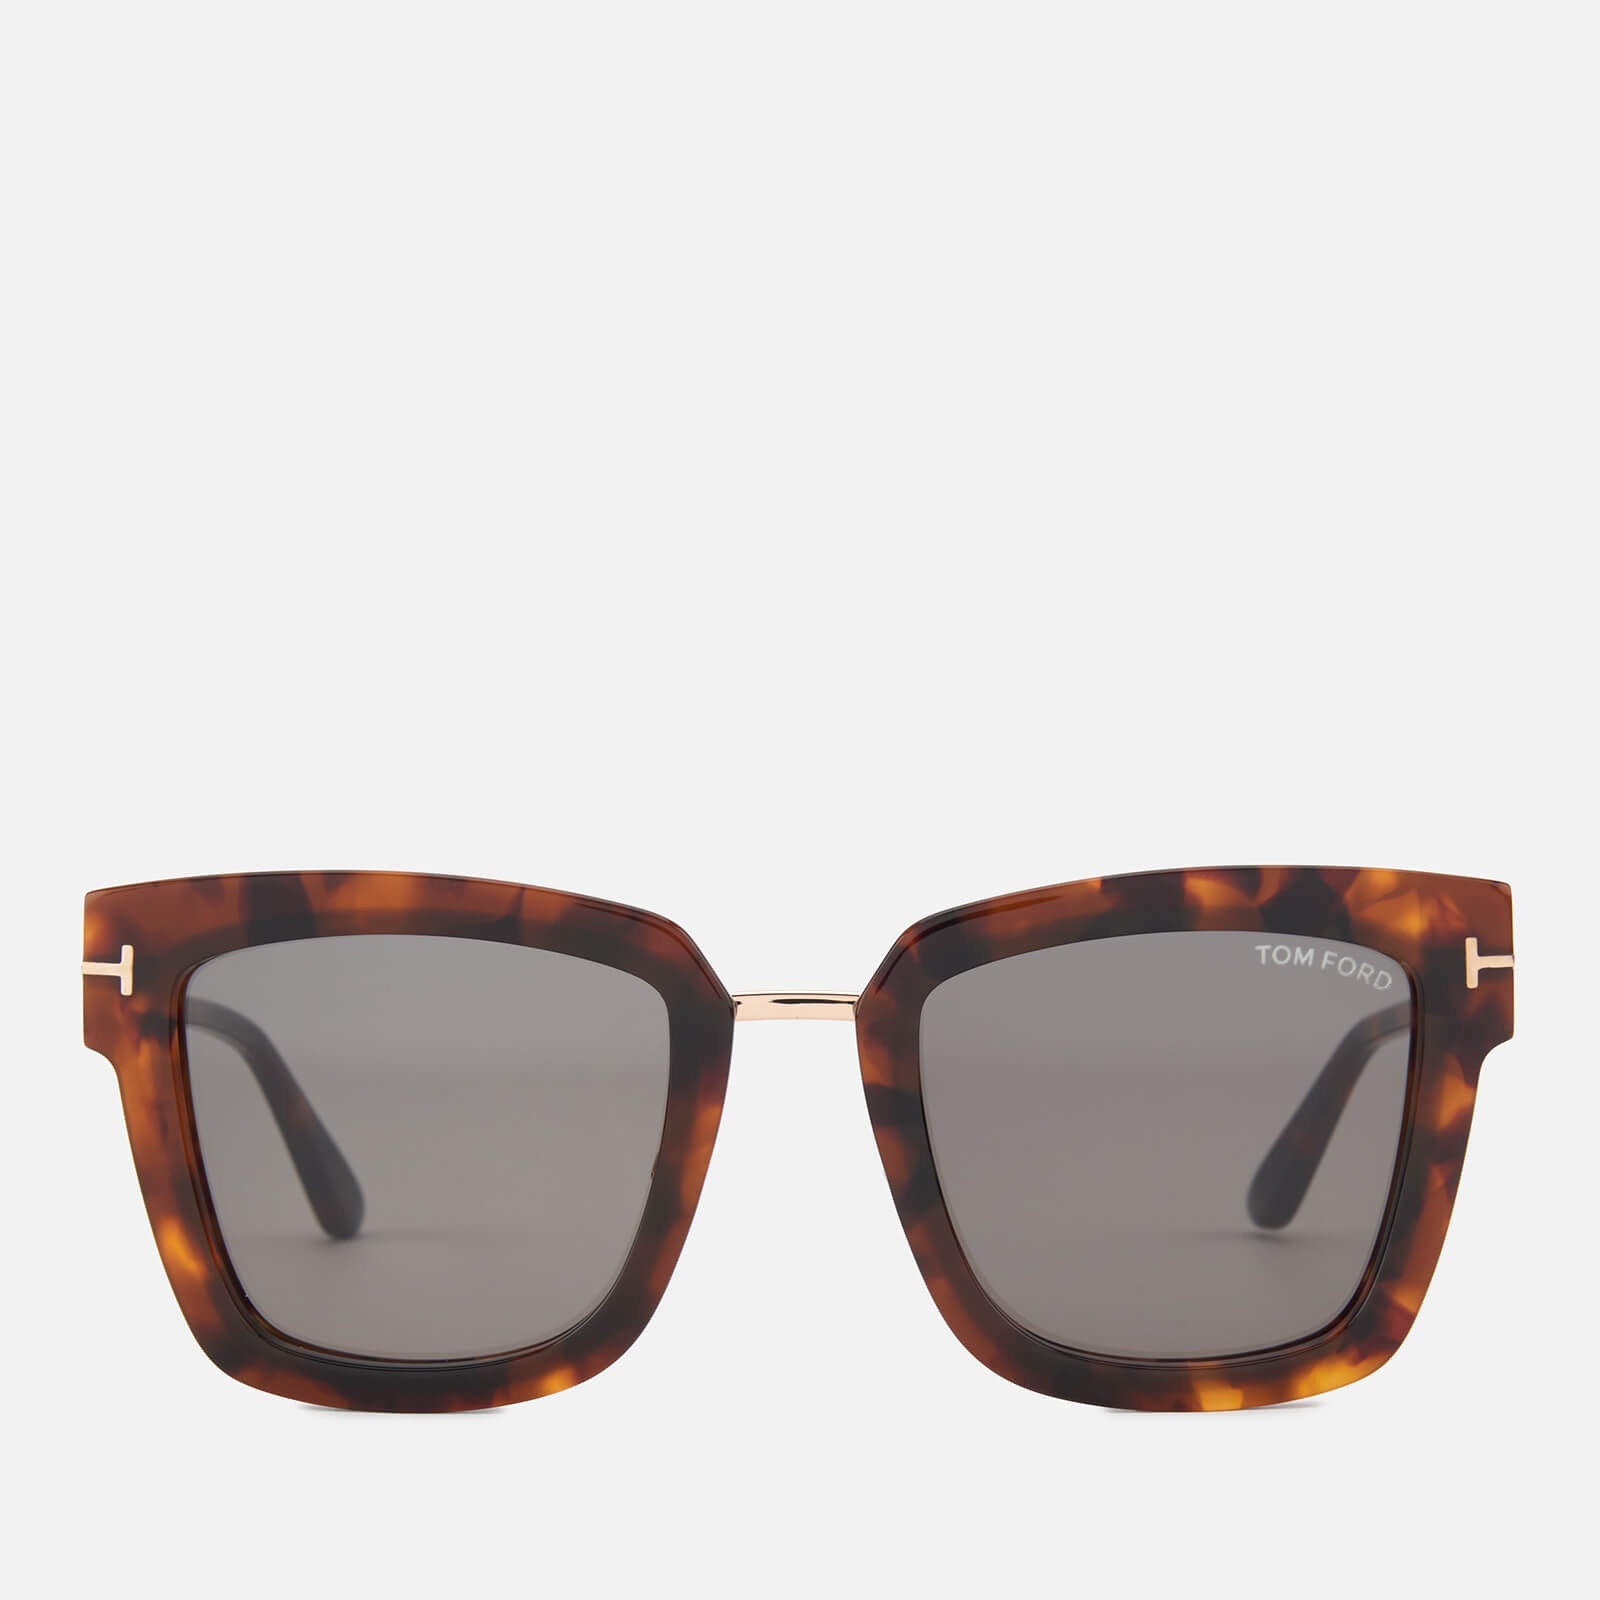 912d7a2c015 Tom Ford Women s Lara Sunglasses - Dark Havana - Free UK Delivery over £50